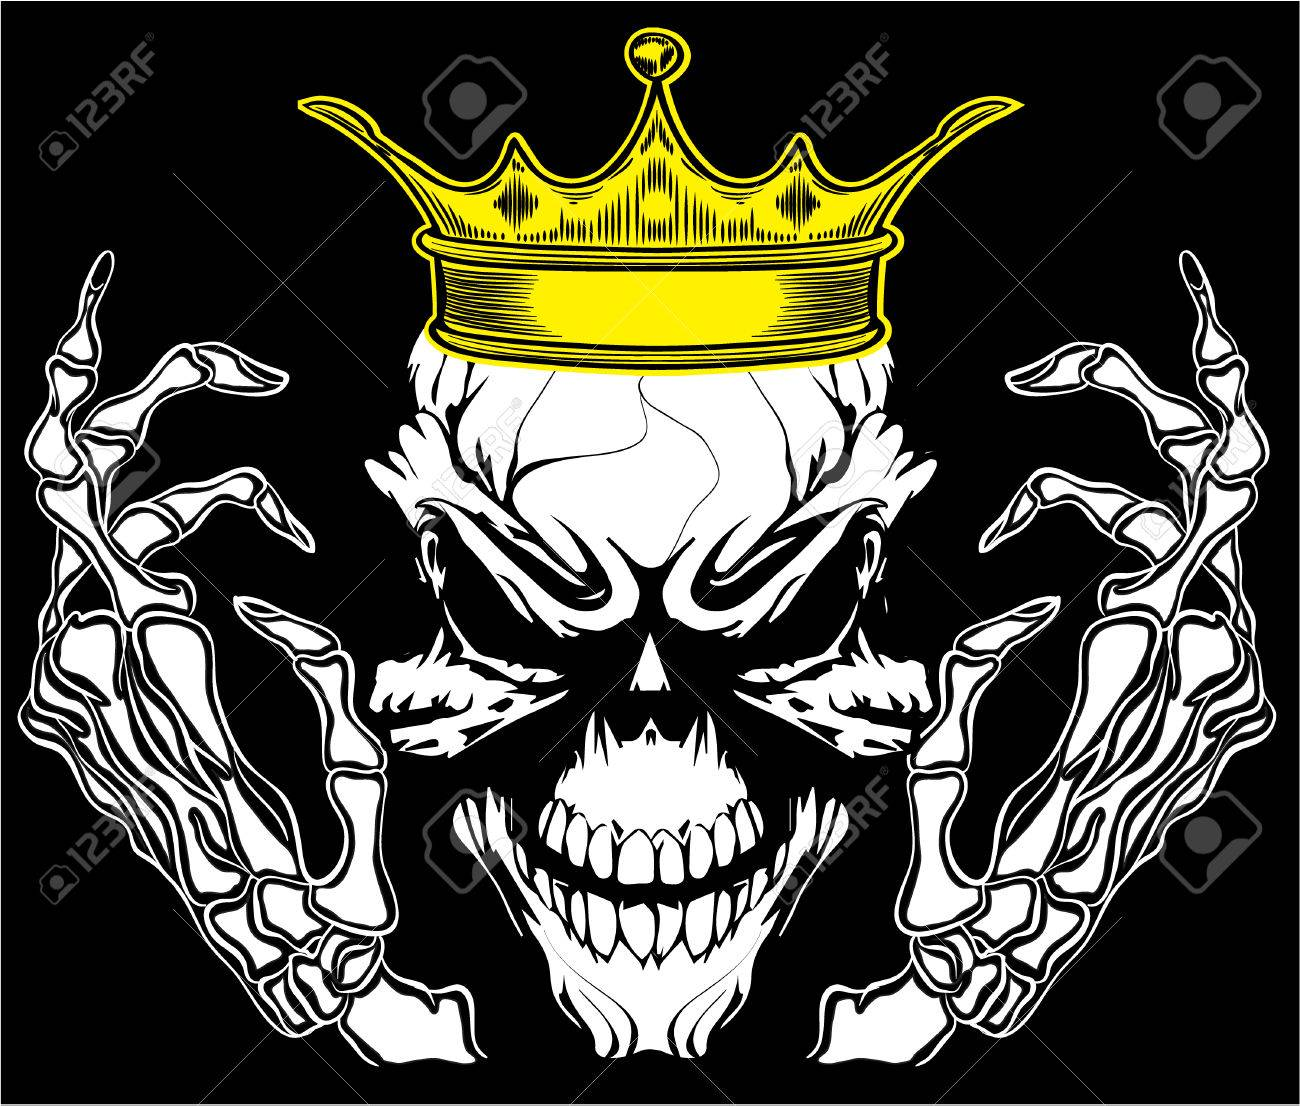 Design t shirt skull - Skull King Poster Vintage Man T Shirt Graphic Vector Design Stock Vector 32485618